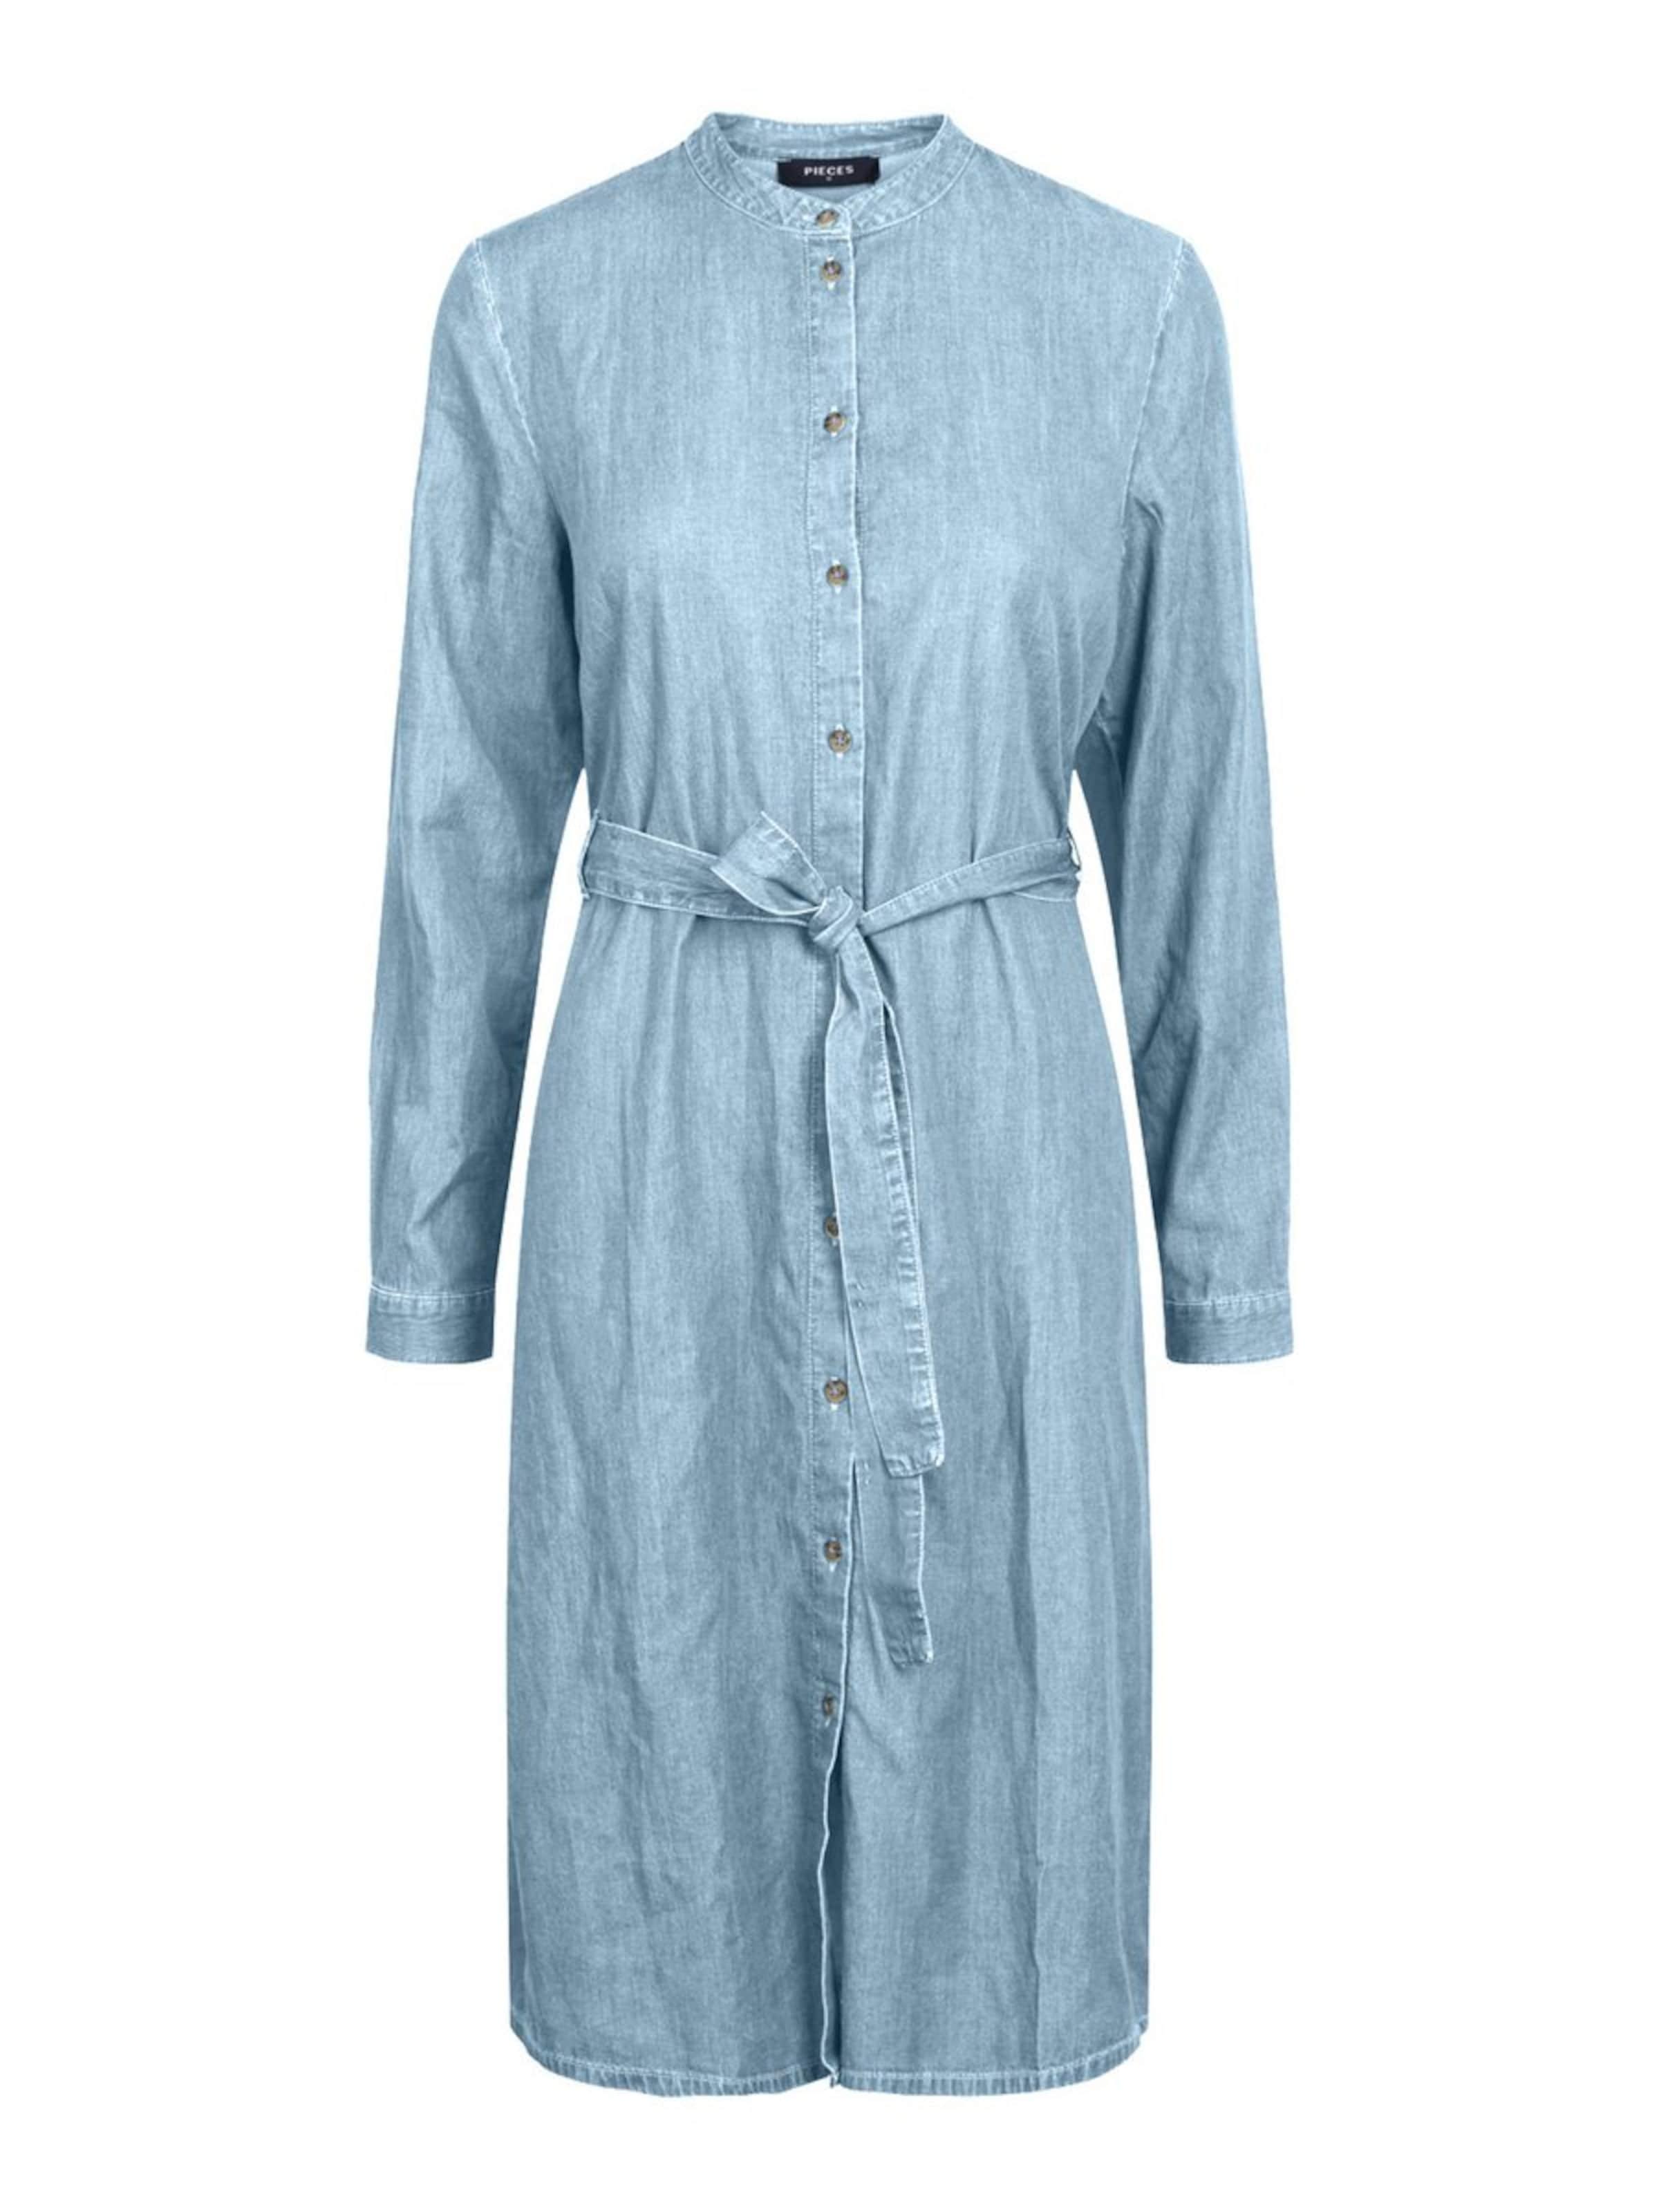 Pieces En Denim Pieces Robe Bleu Robe BhrdCQotsx